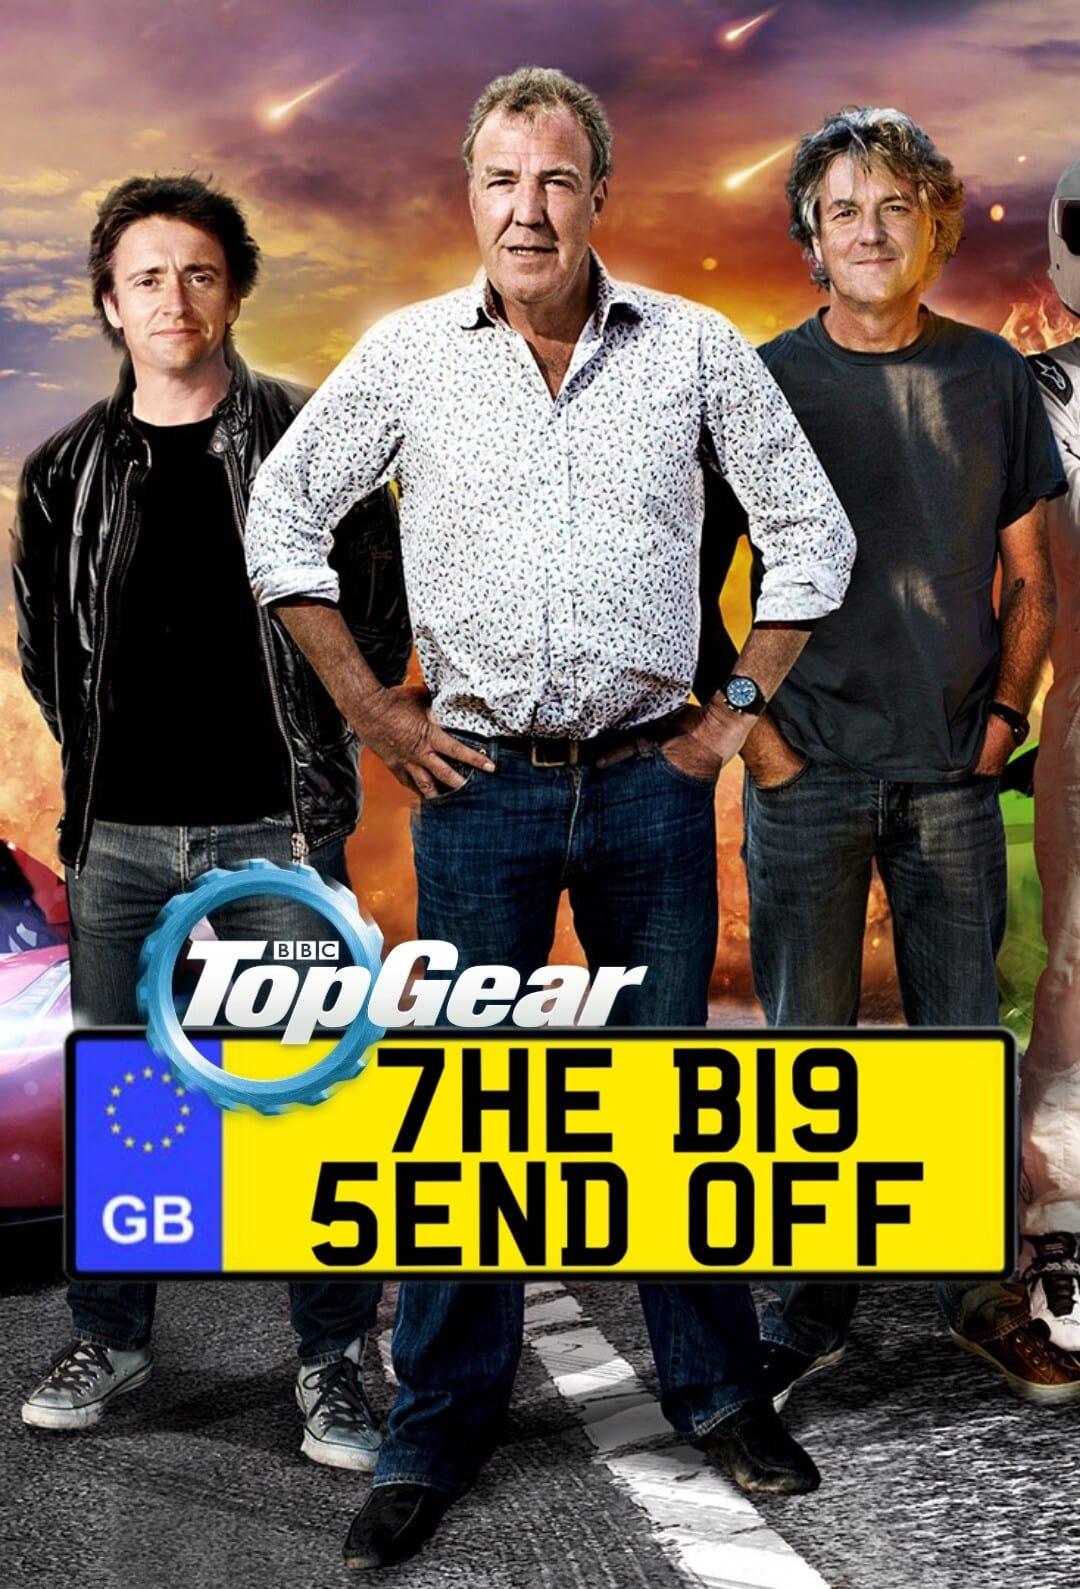 Top Gear: The Big Send Off Special